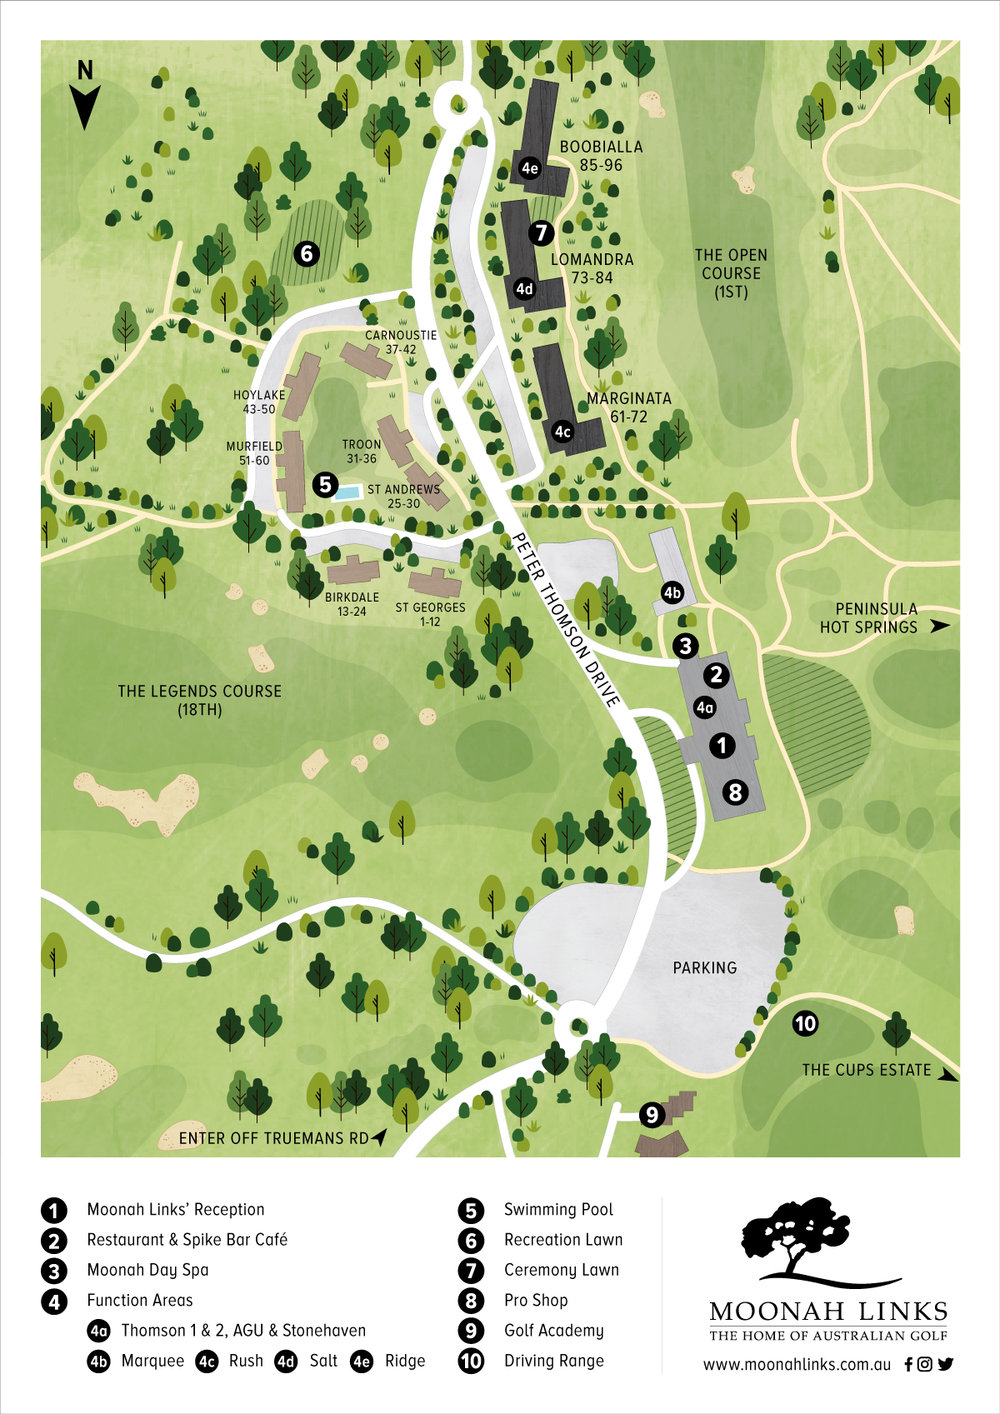 Moonah-Links-Illustrated-Map.jpg